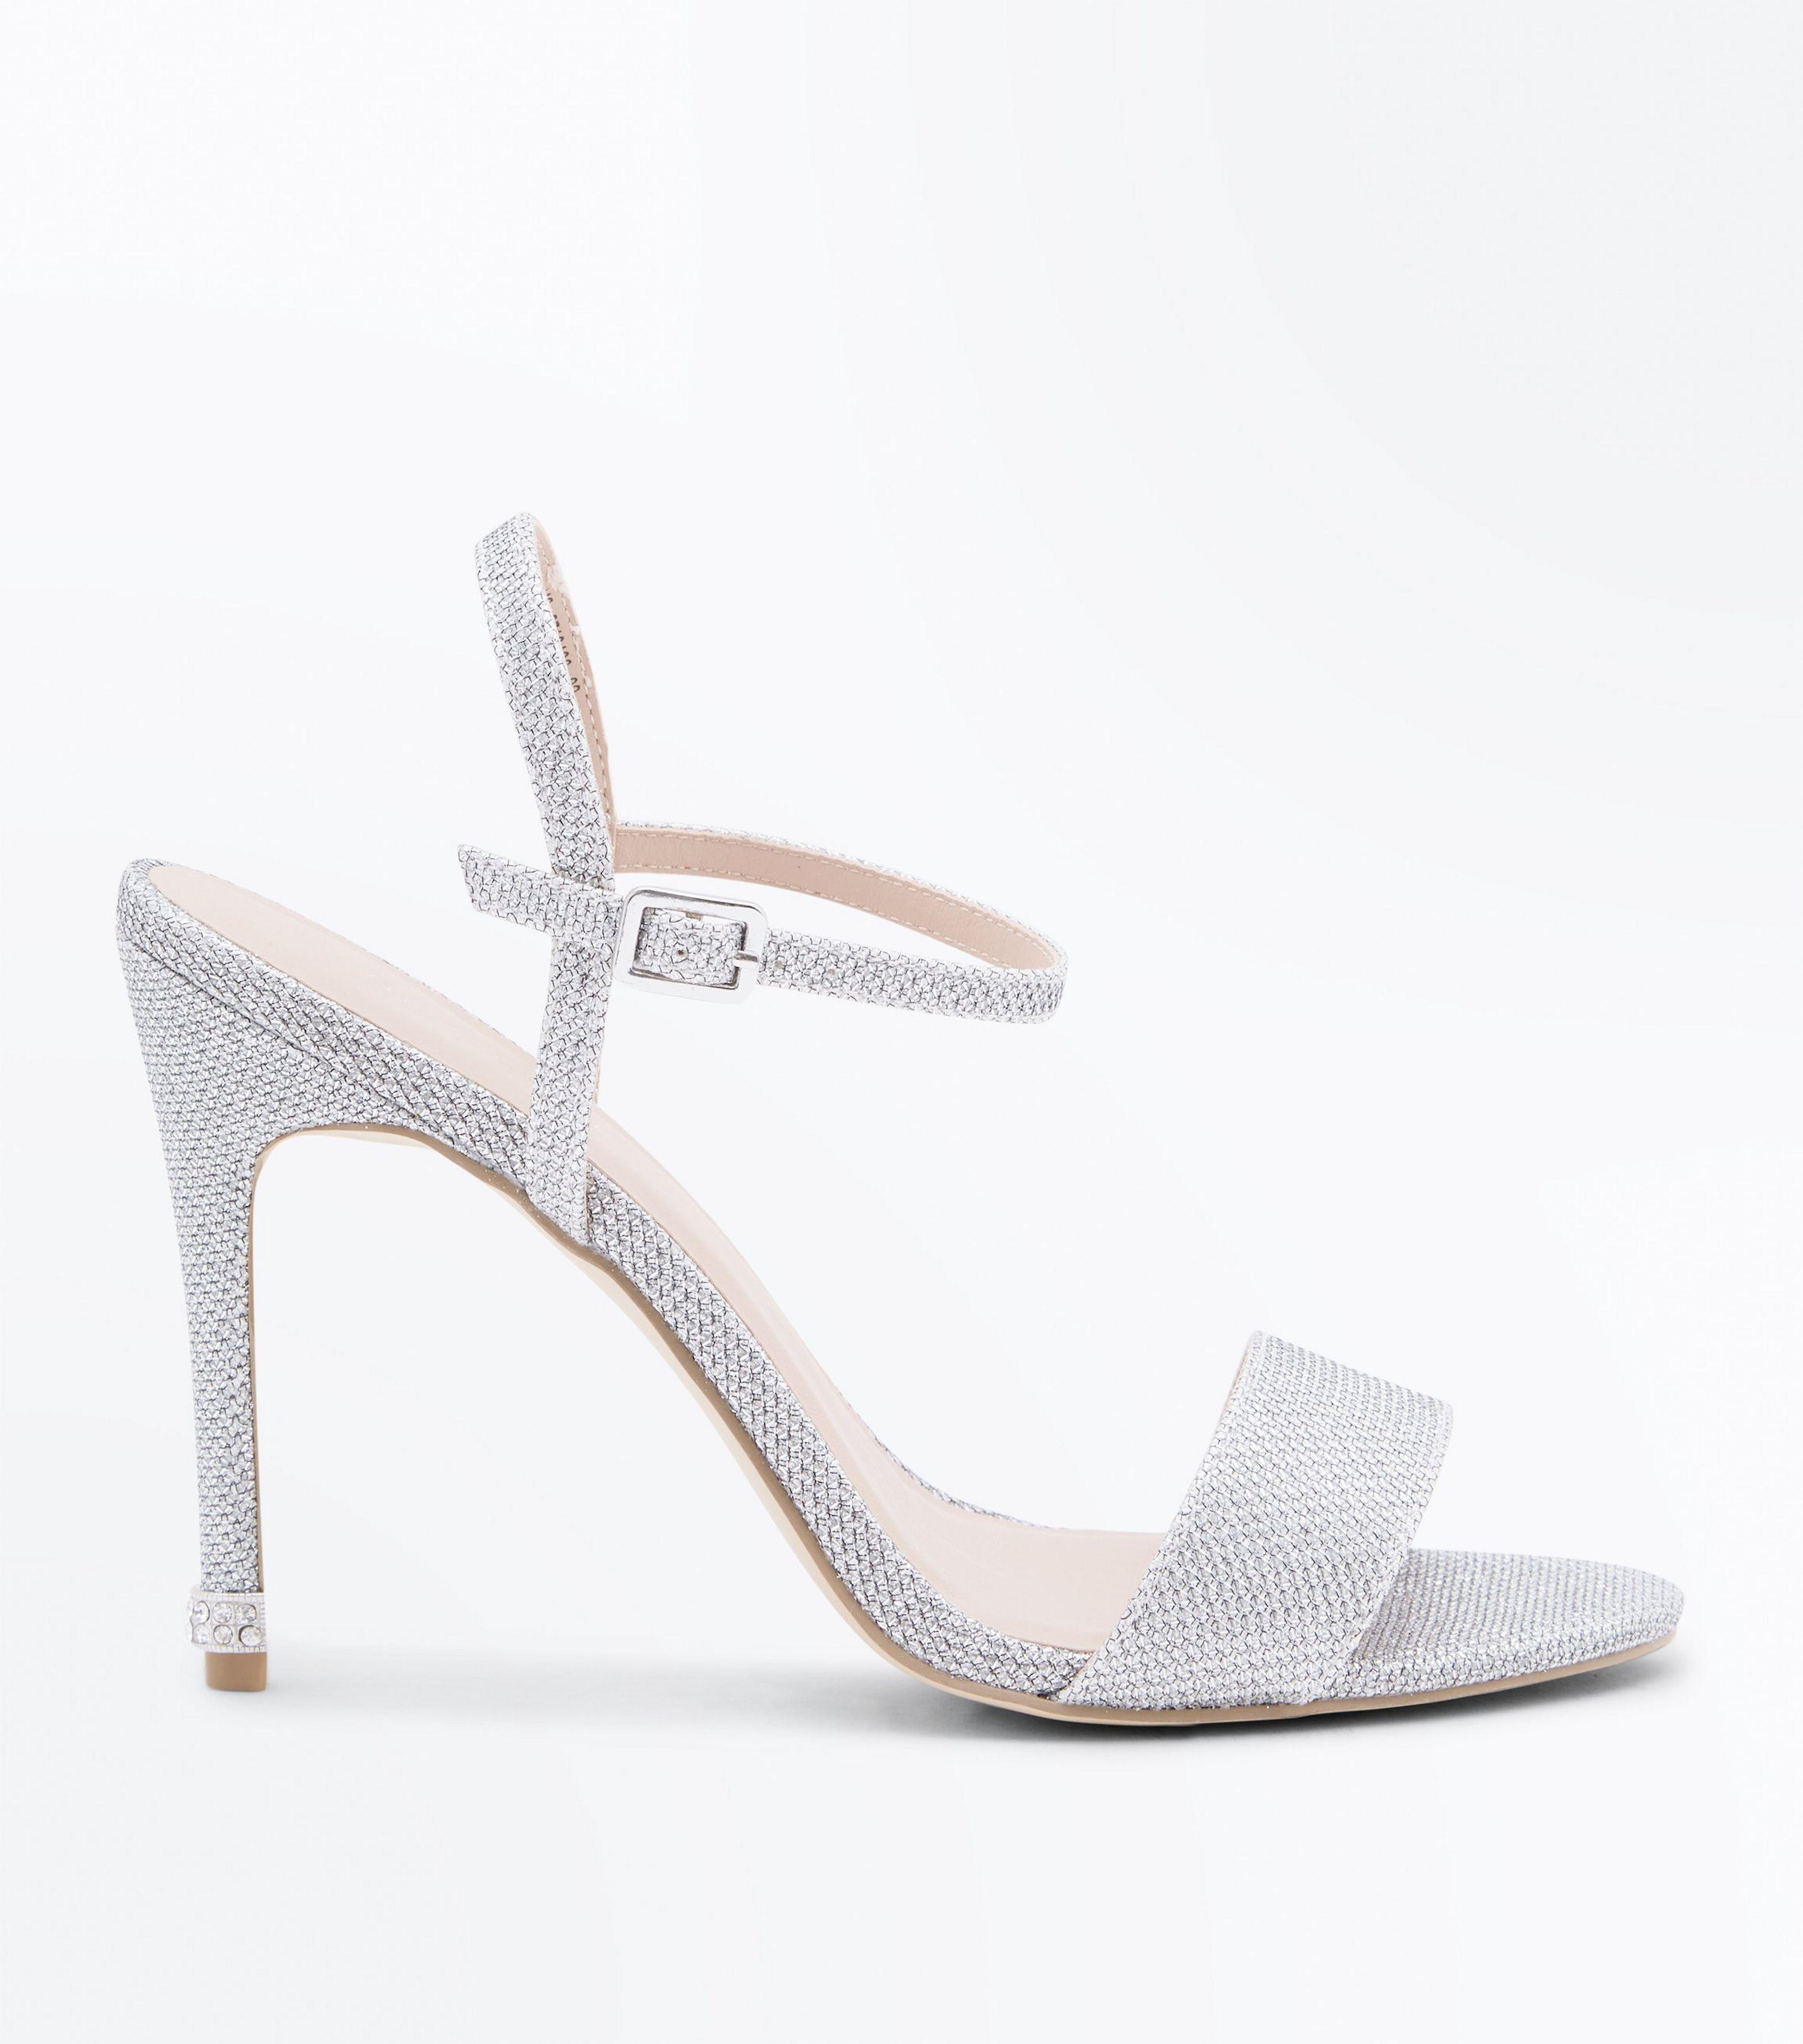 bc69458eaa7 New Look Silver Glitter Diamanté Stiletto Heel Sandals in Metallic ...